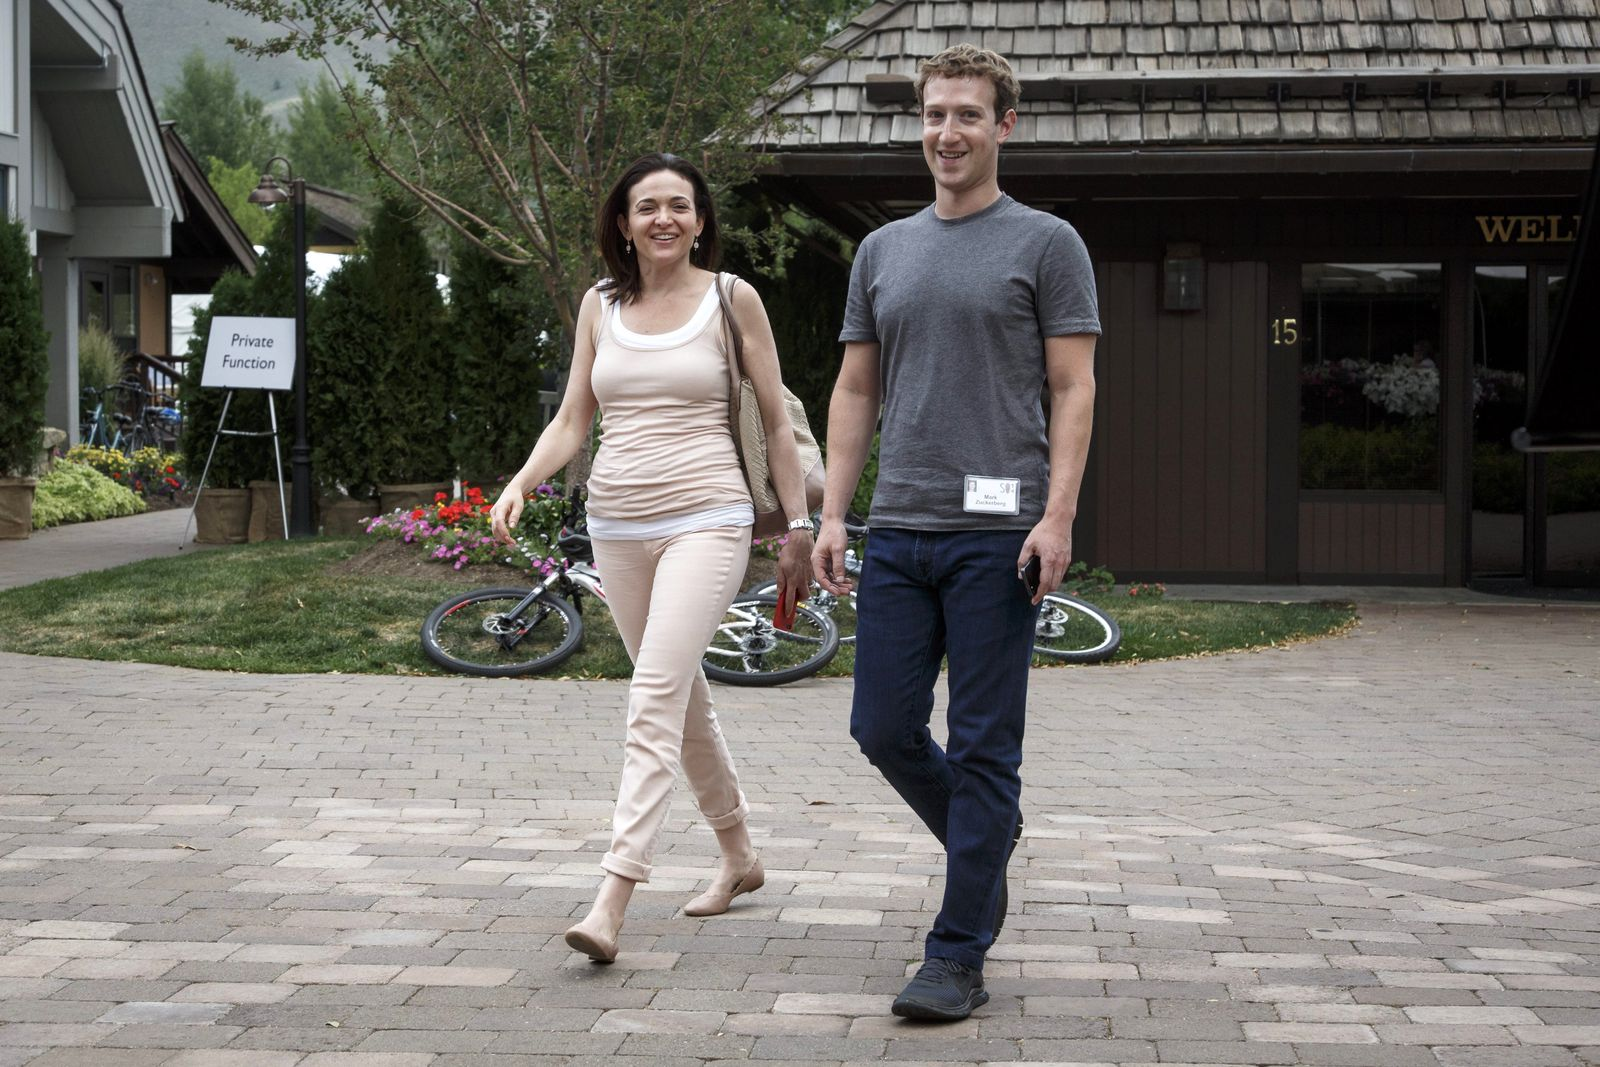 Mark Zuckerberg / Sheryl Sandberg